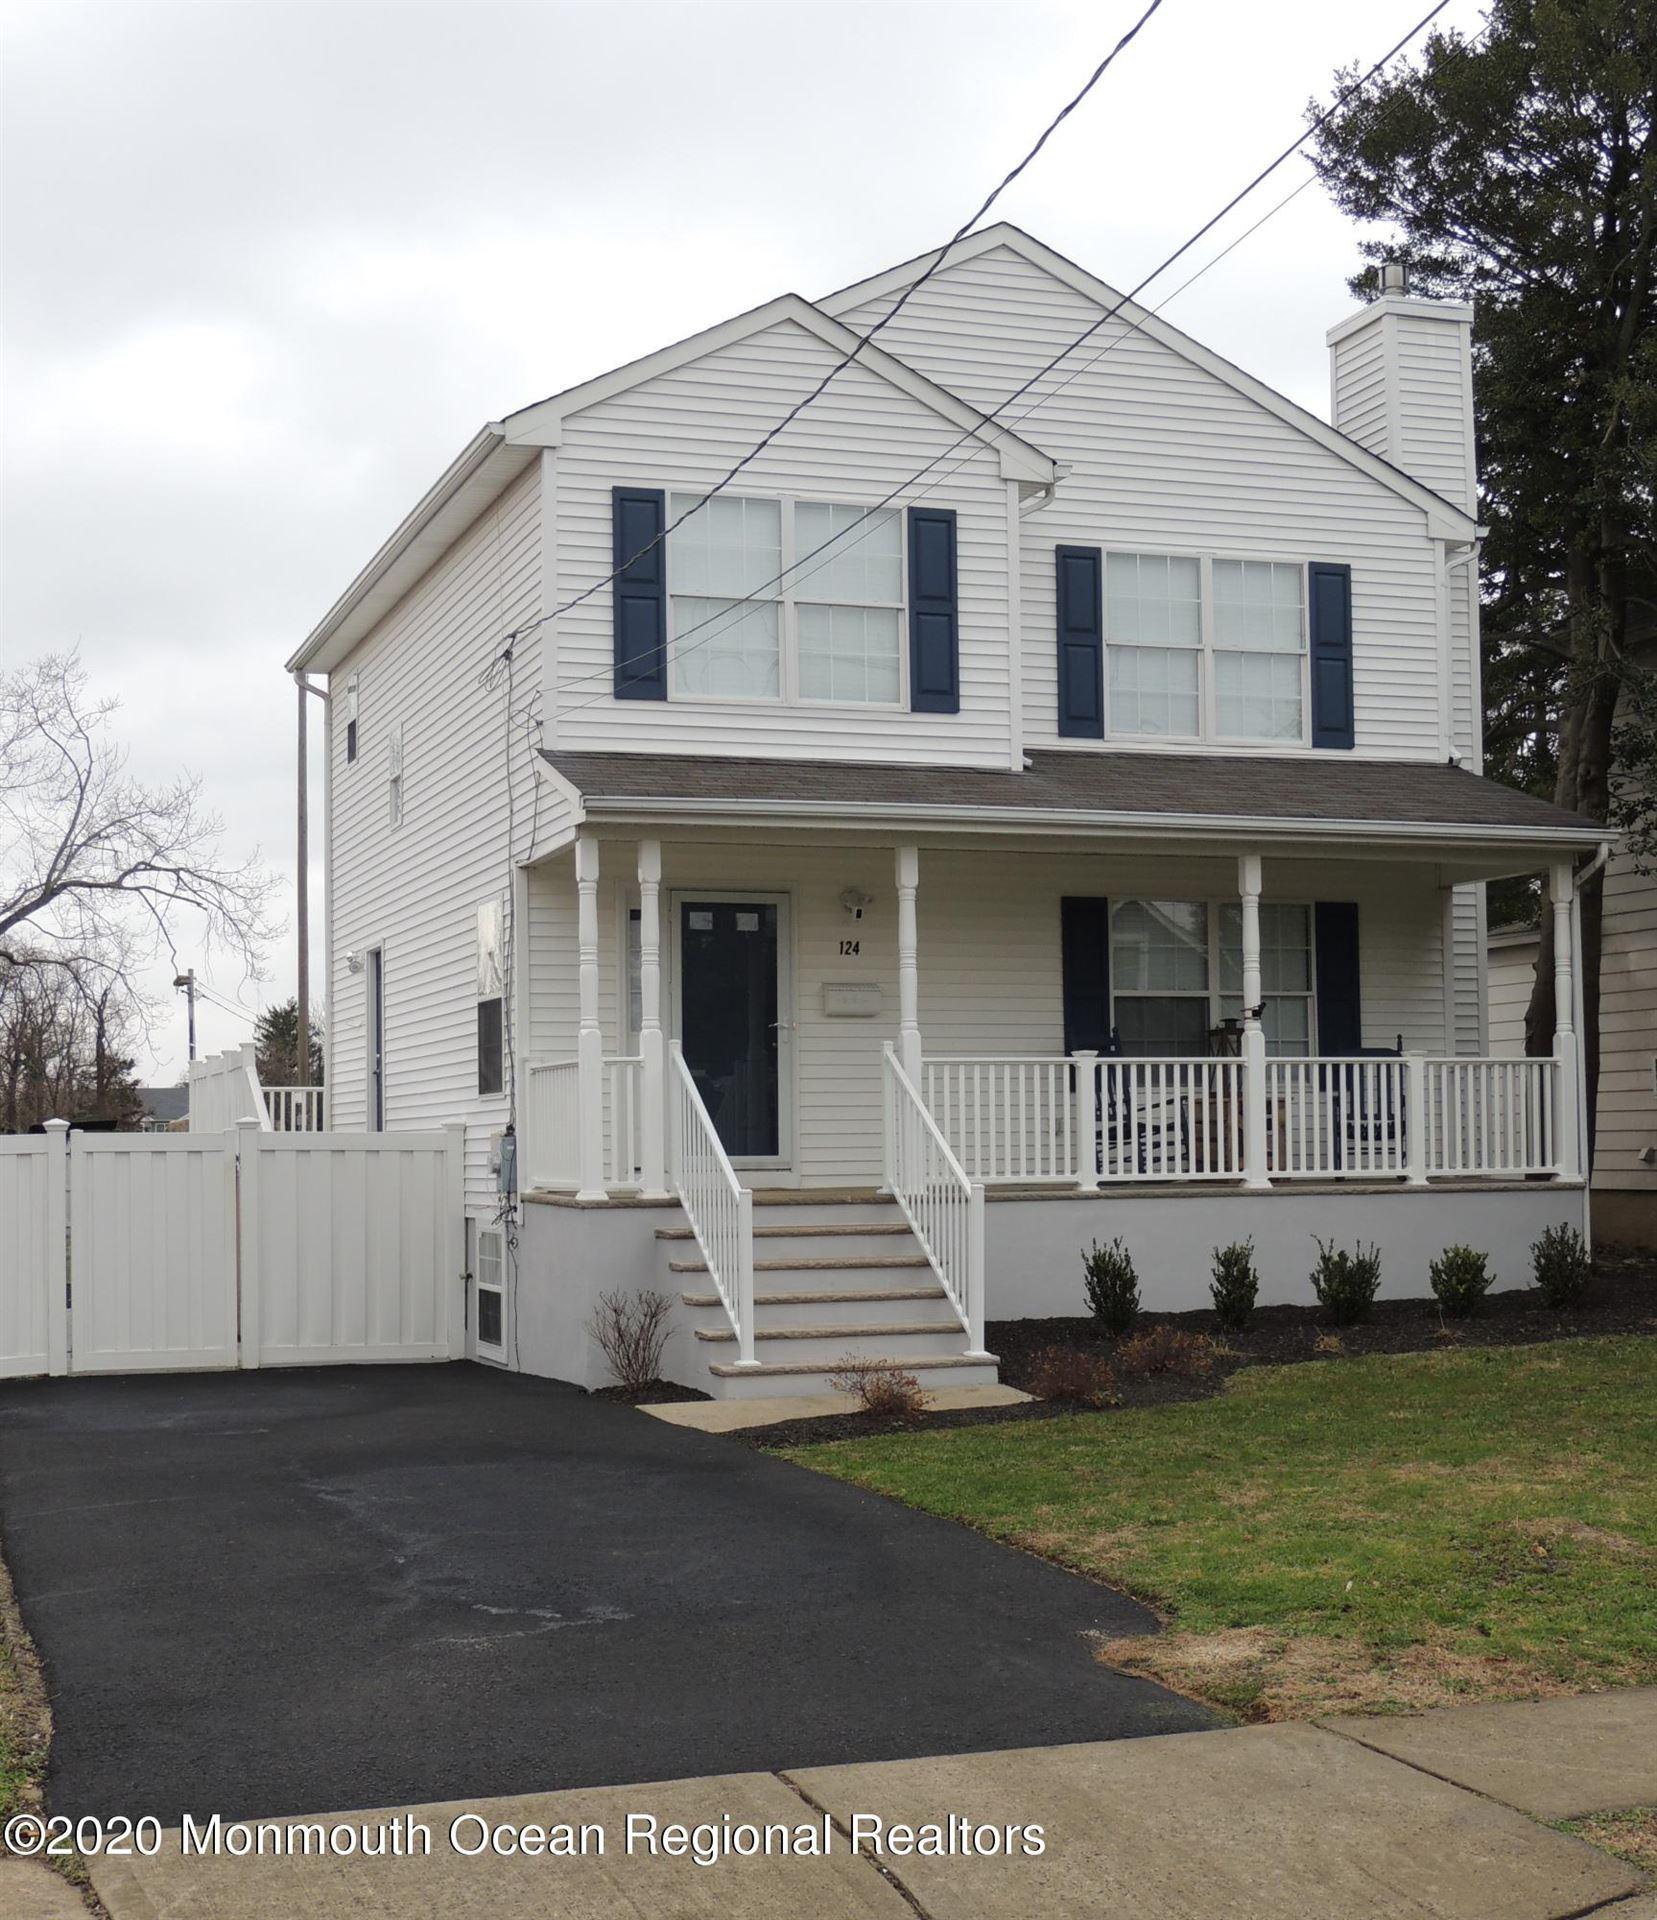 124 W Westside Avenue Red Bank Nj 07701 Mls 22031863 Listing Information Real Living Preferred Real Estate Real Living Real Estate